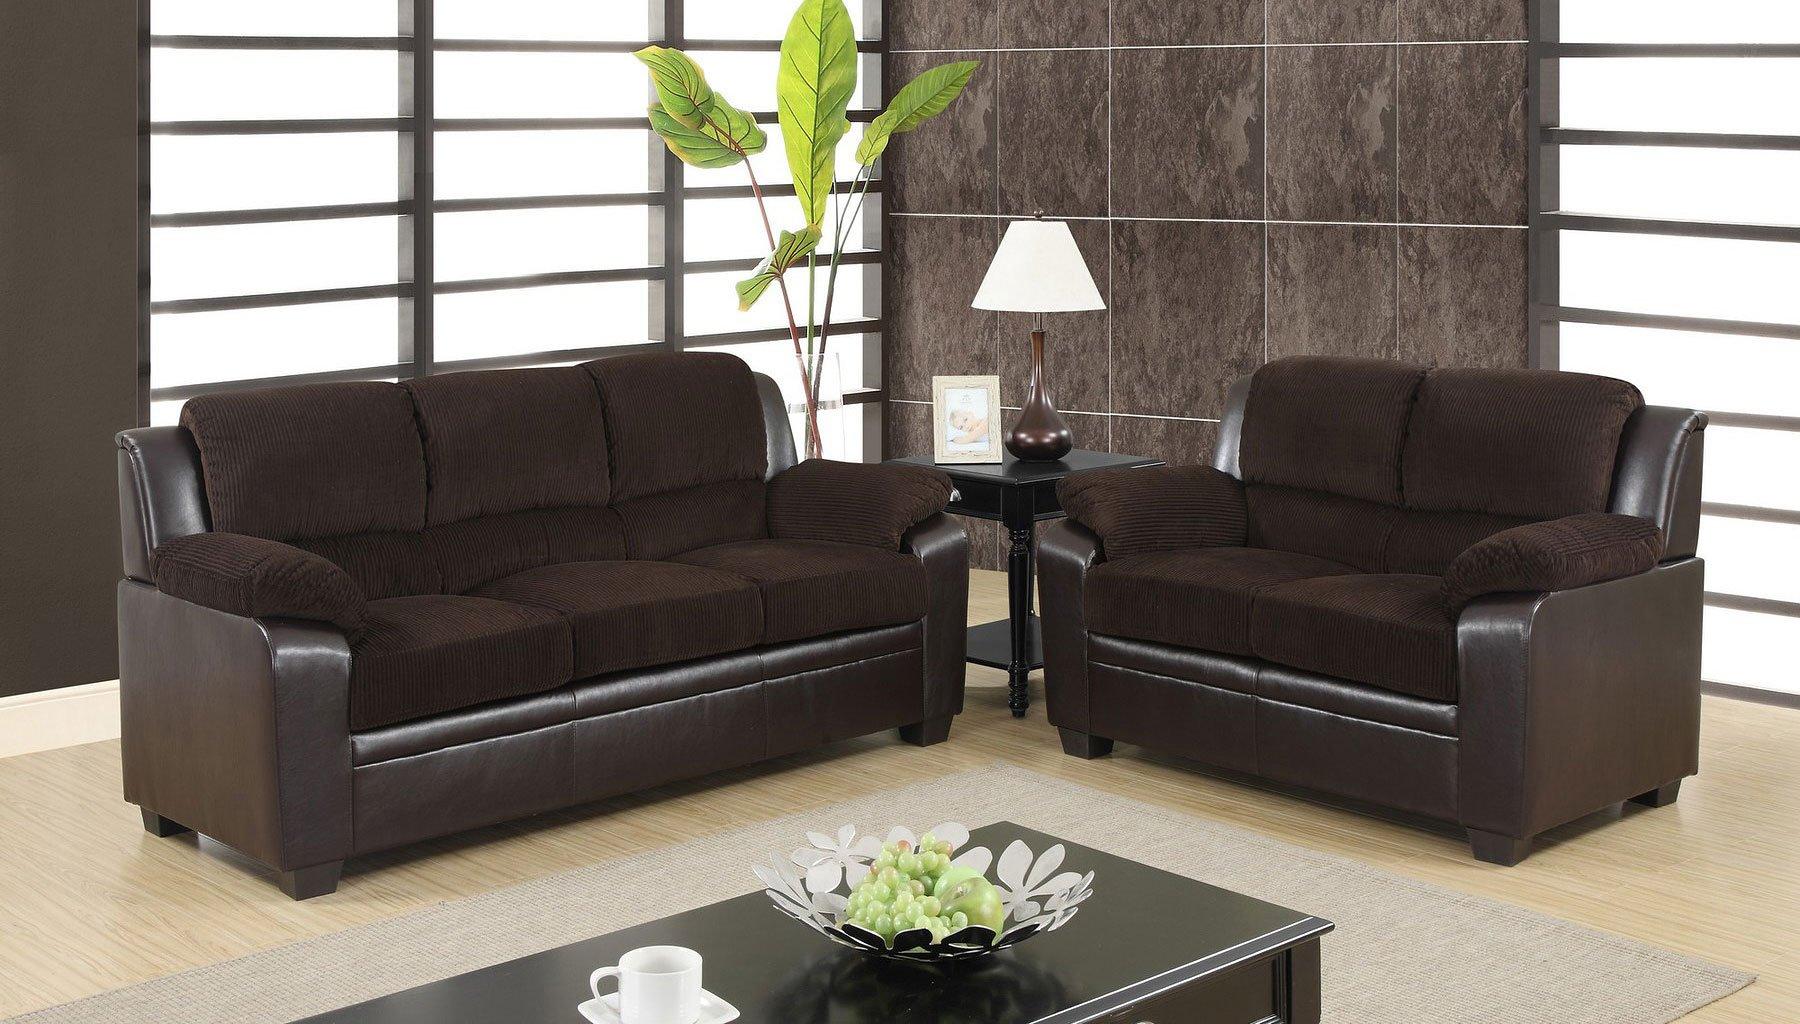 U880018 Living Room Set Corduroy And Pvc Living Room Sets Living Room Furniture Living Room